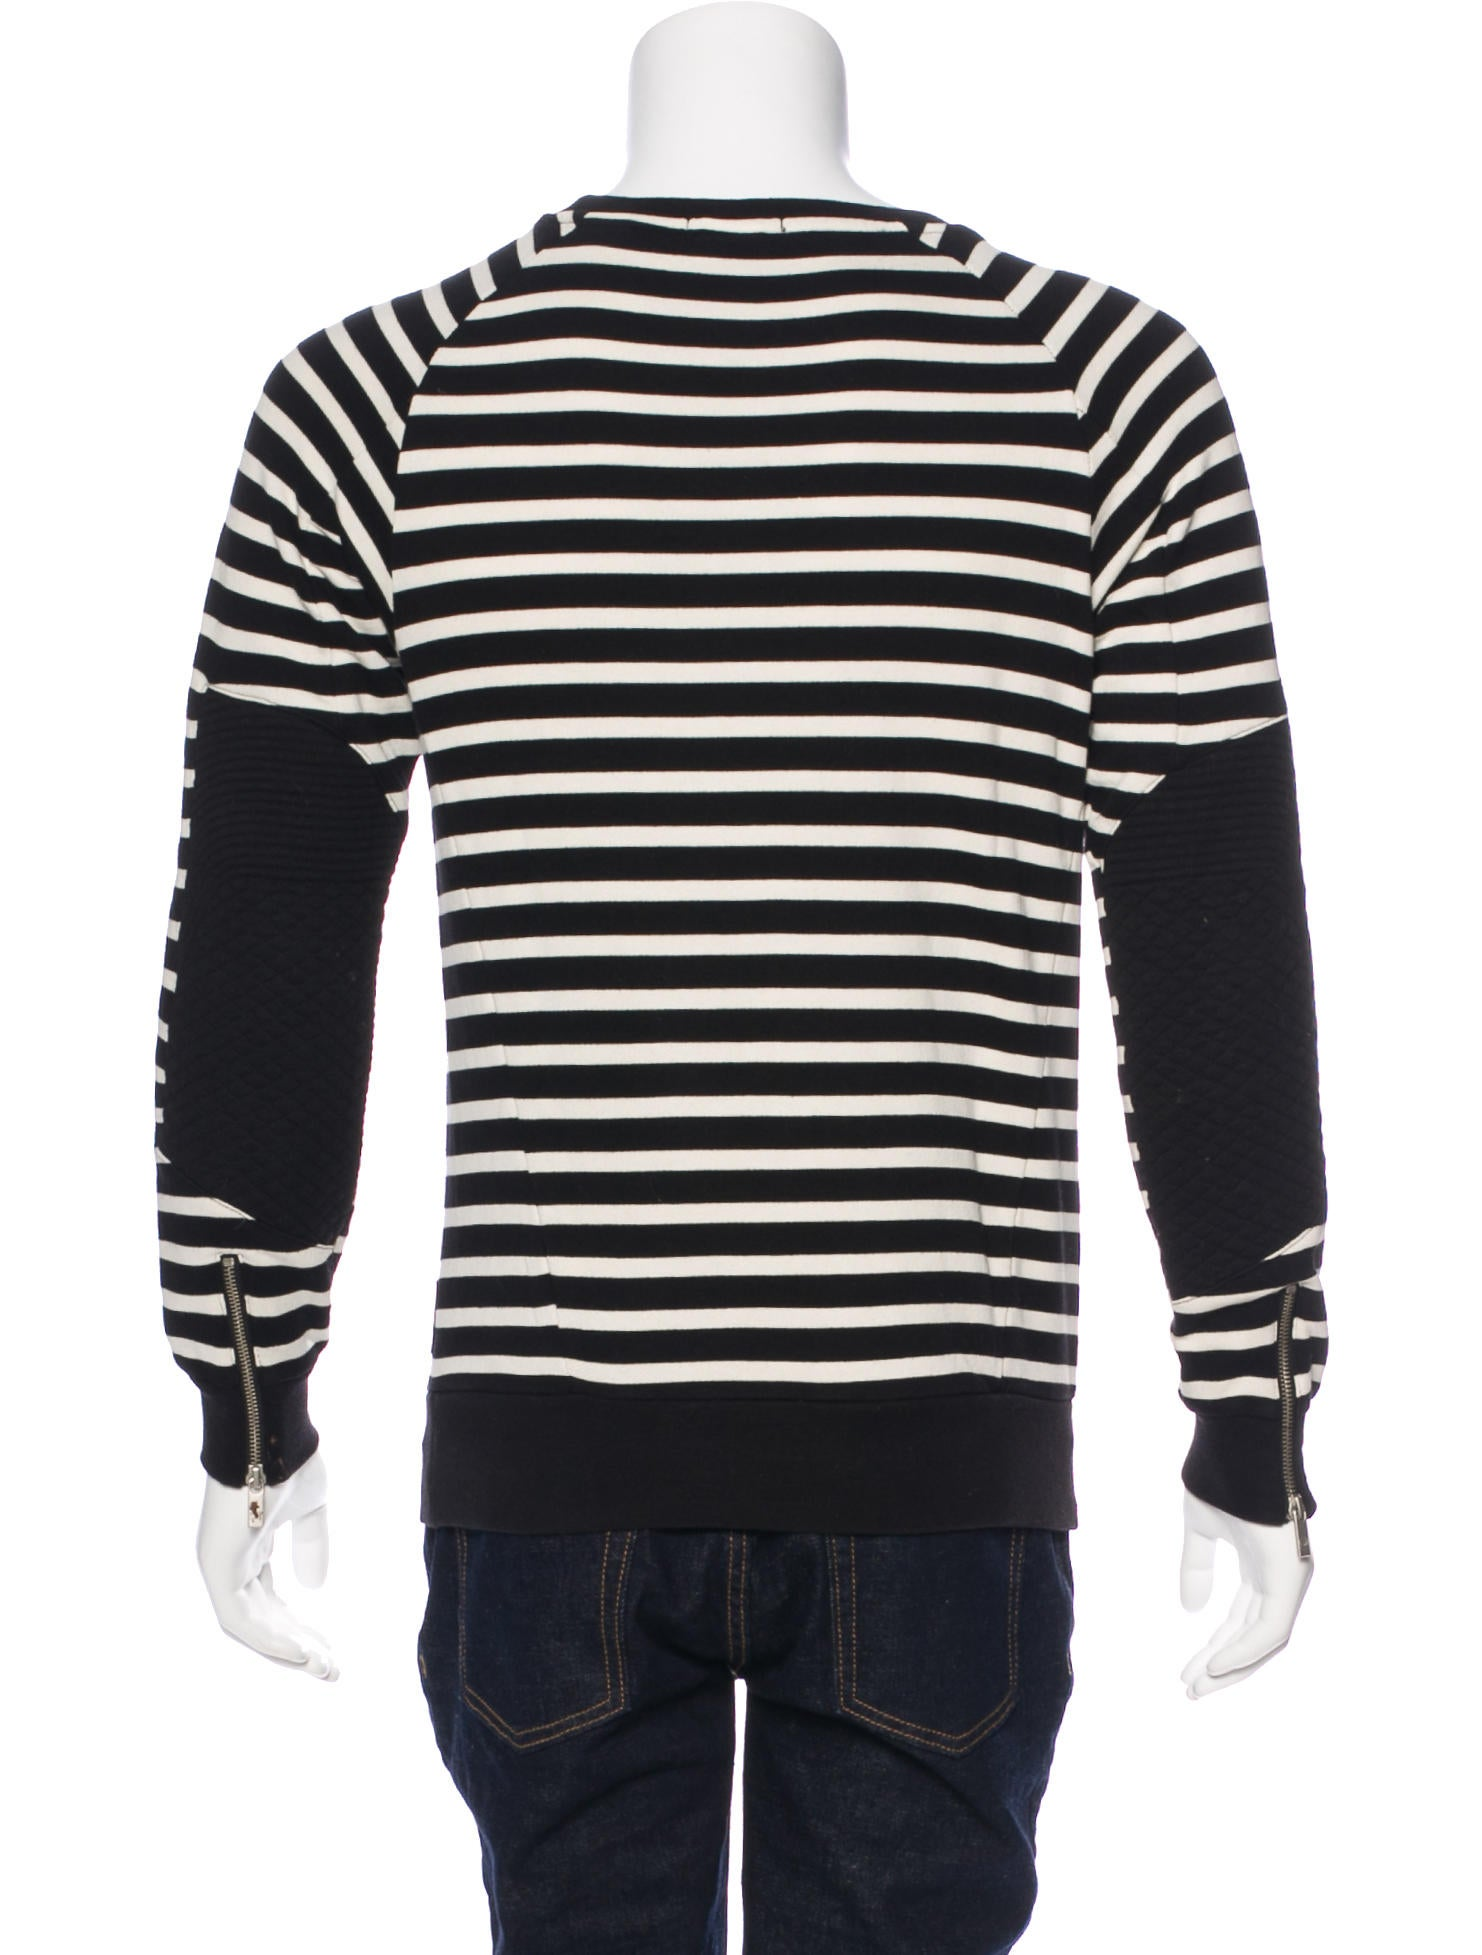 scotch soda striped pullover sweatshirt clothing. Black Bedroom Furniture Sets. Home Design Ideas